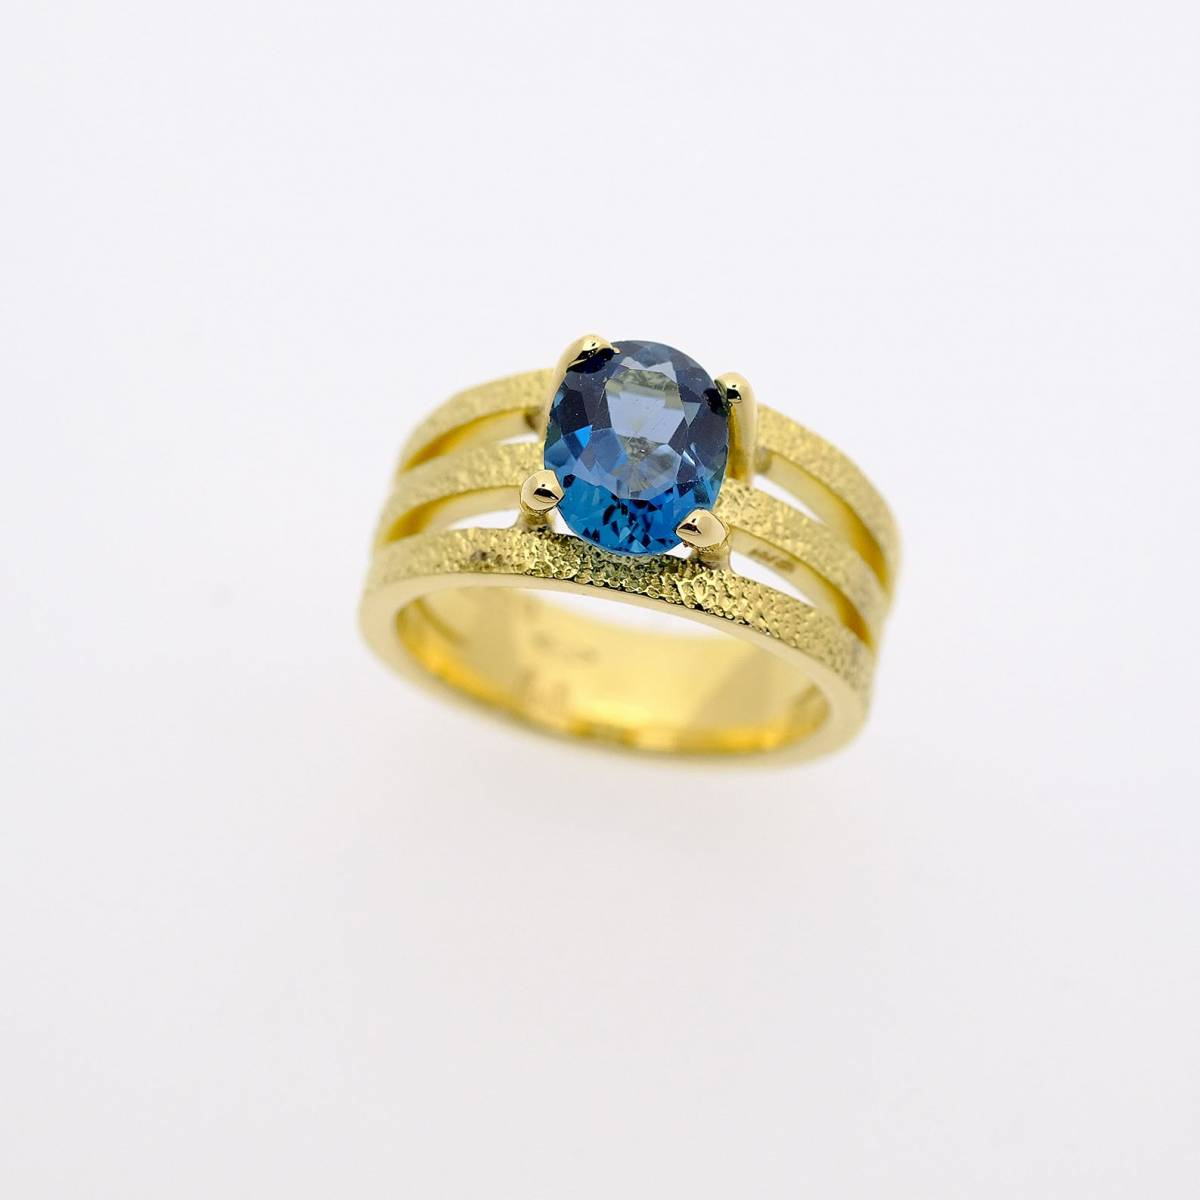 Jonas Maes Jewels - Juwelen - Bruidsjuwelen - Verlovingsring - Trouwring - House of Weddings - 26